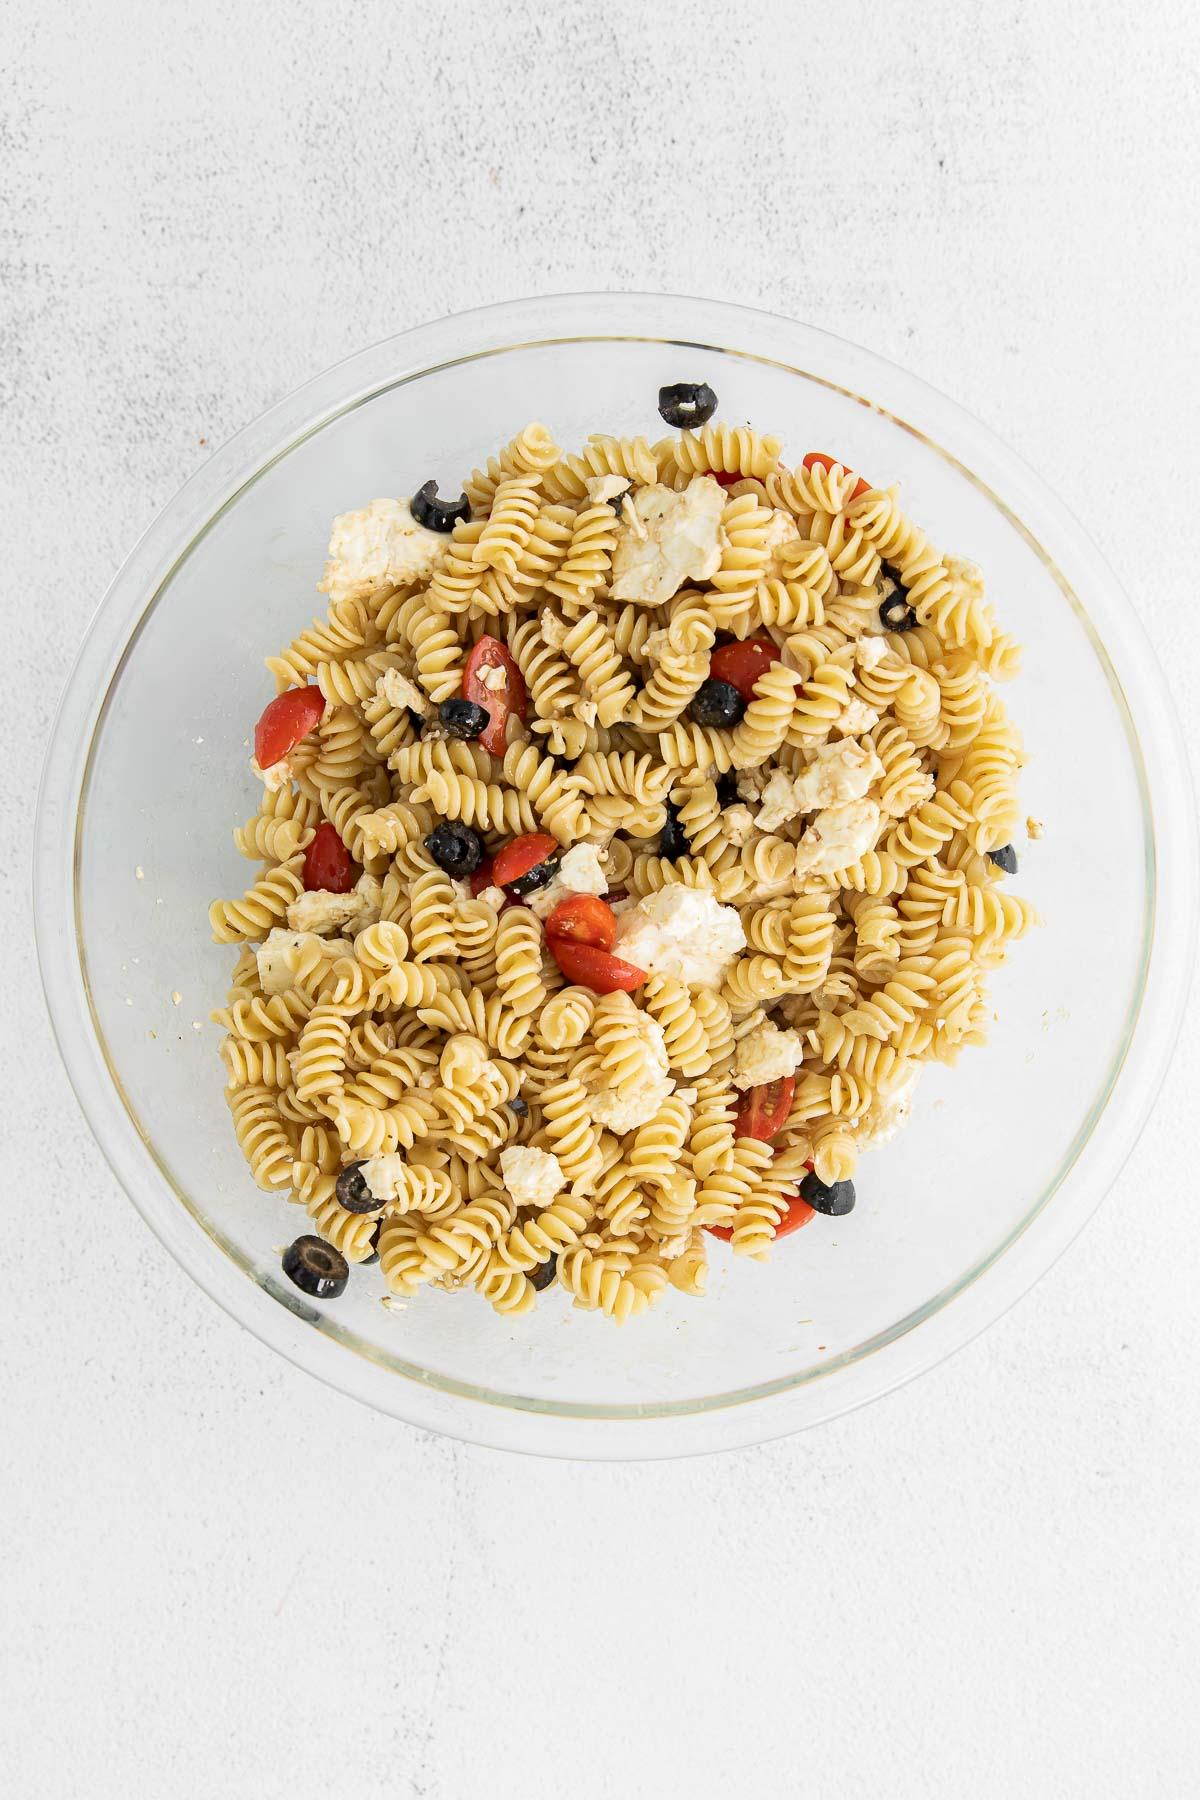 greek pasta salad mixed in a big glass bowl